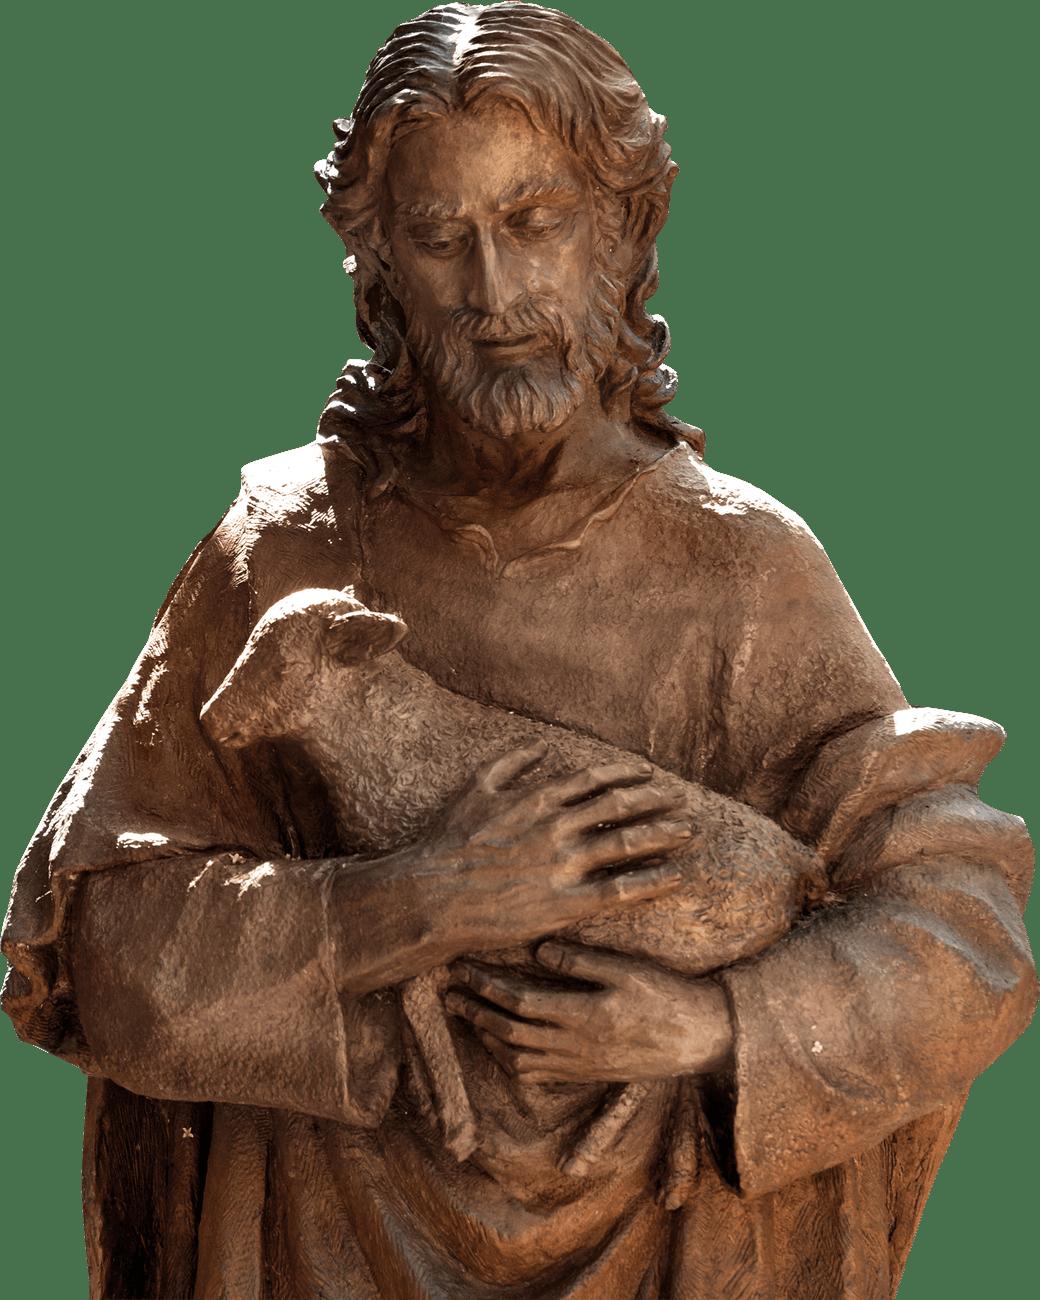 man holding sheep statuette